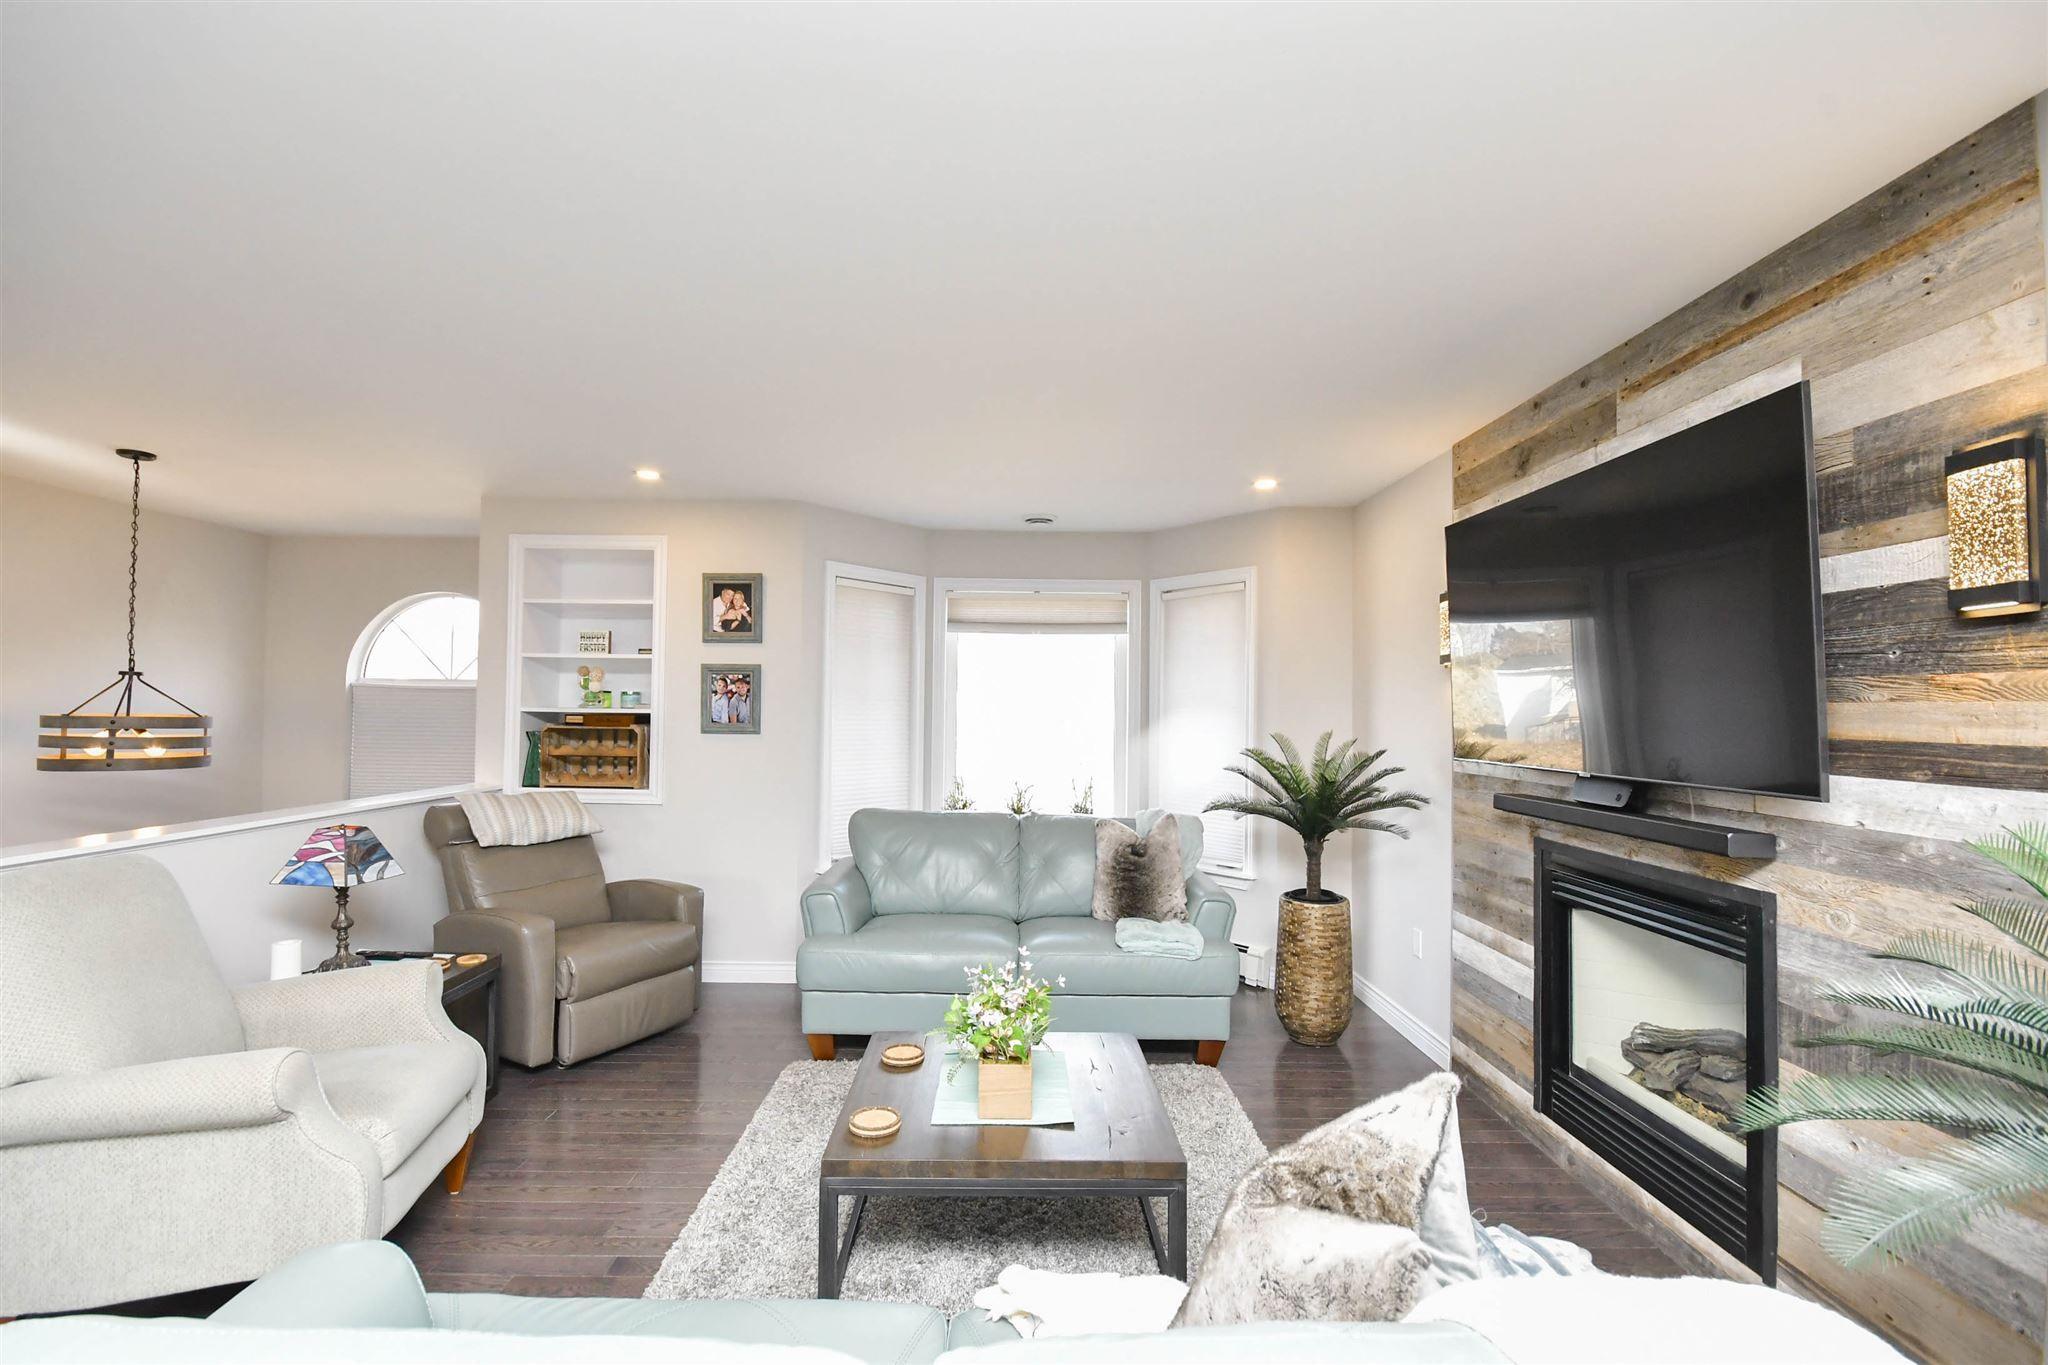 Photo 5: Photos: 17 Armstrong Court in Halifax: 5-Fairmount, Clayton Park, Rockingham Residential for sale (Halifax-Dartmouth)  : MLS®# 202105075